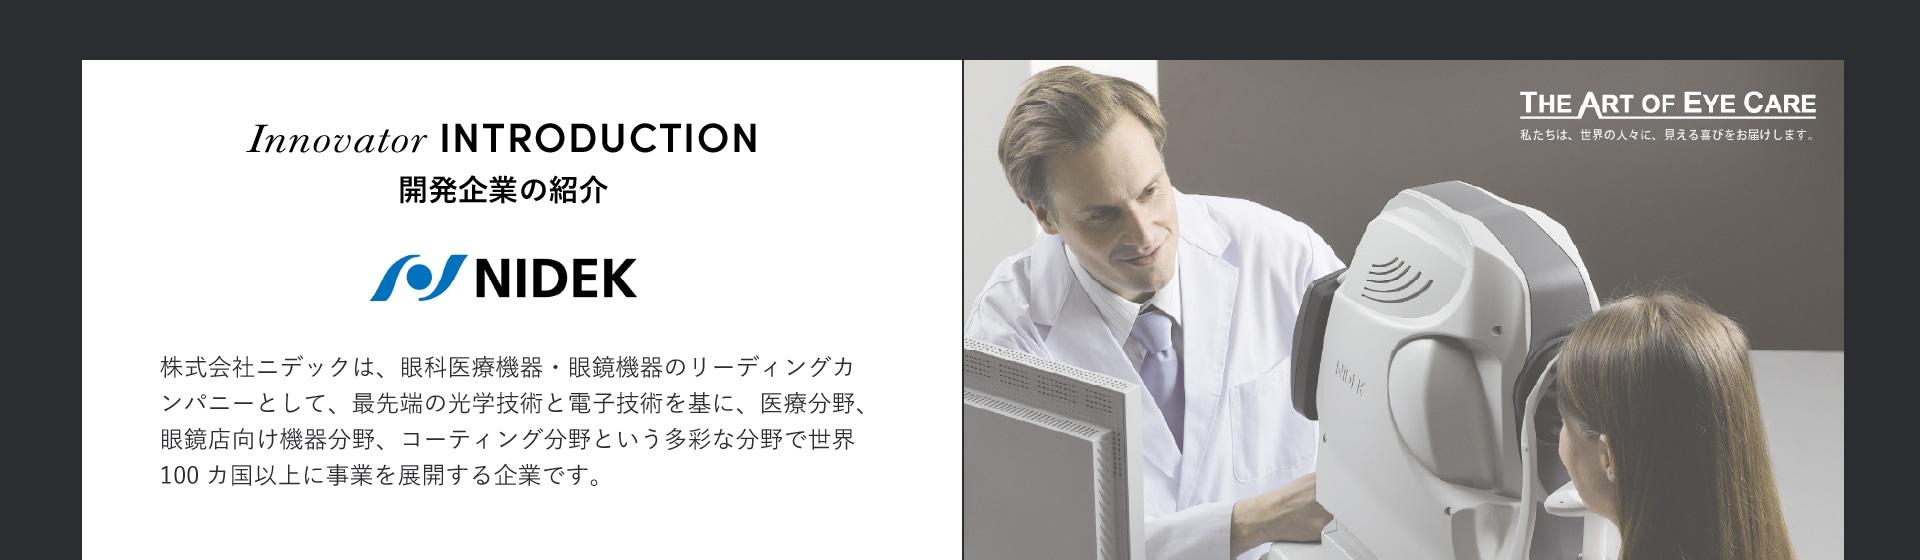 Innovator INTRODUCTION 開発企業の紹介 株式会社ニデックは、眼科医療機器・眼鏡機器のリーディングカンパニーとして、最先端の光学技術と電子技術を基に、医療分野、眼鏡店向け機器分野、コーティング分野という多彩な分野で世界100カ国以上に事業を展開する企業です。